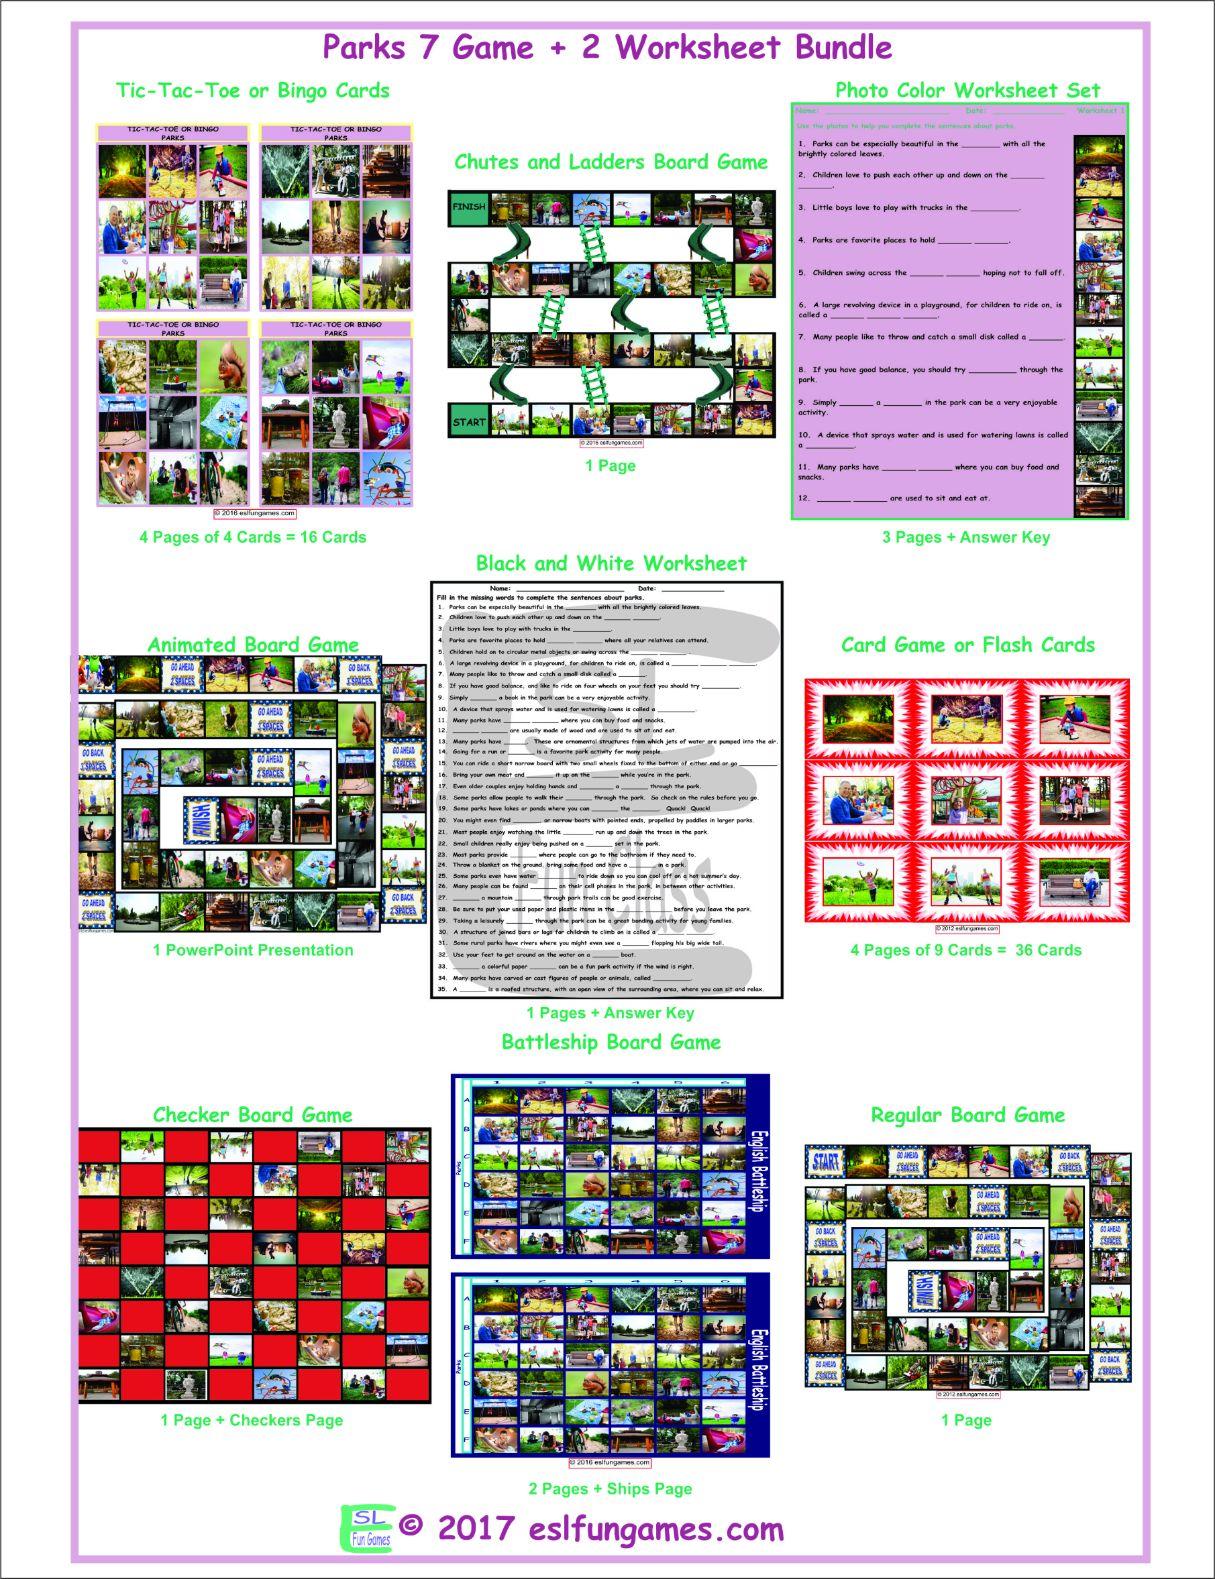 Parks 7 Game Plus 2 Worksheet Bundle